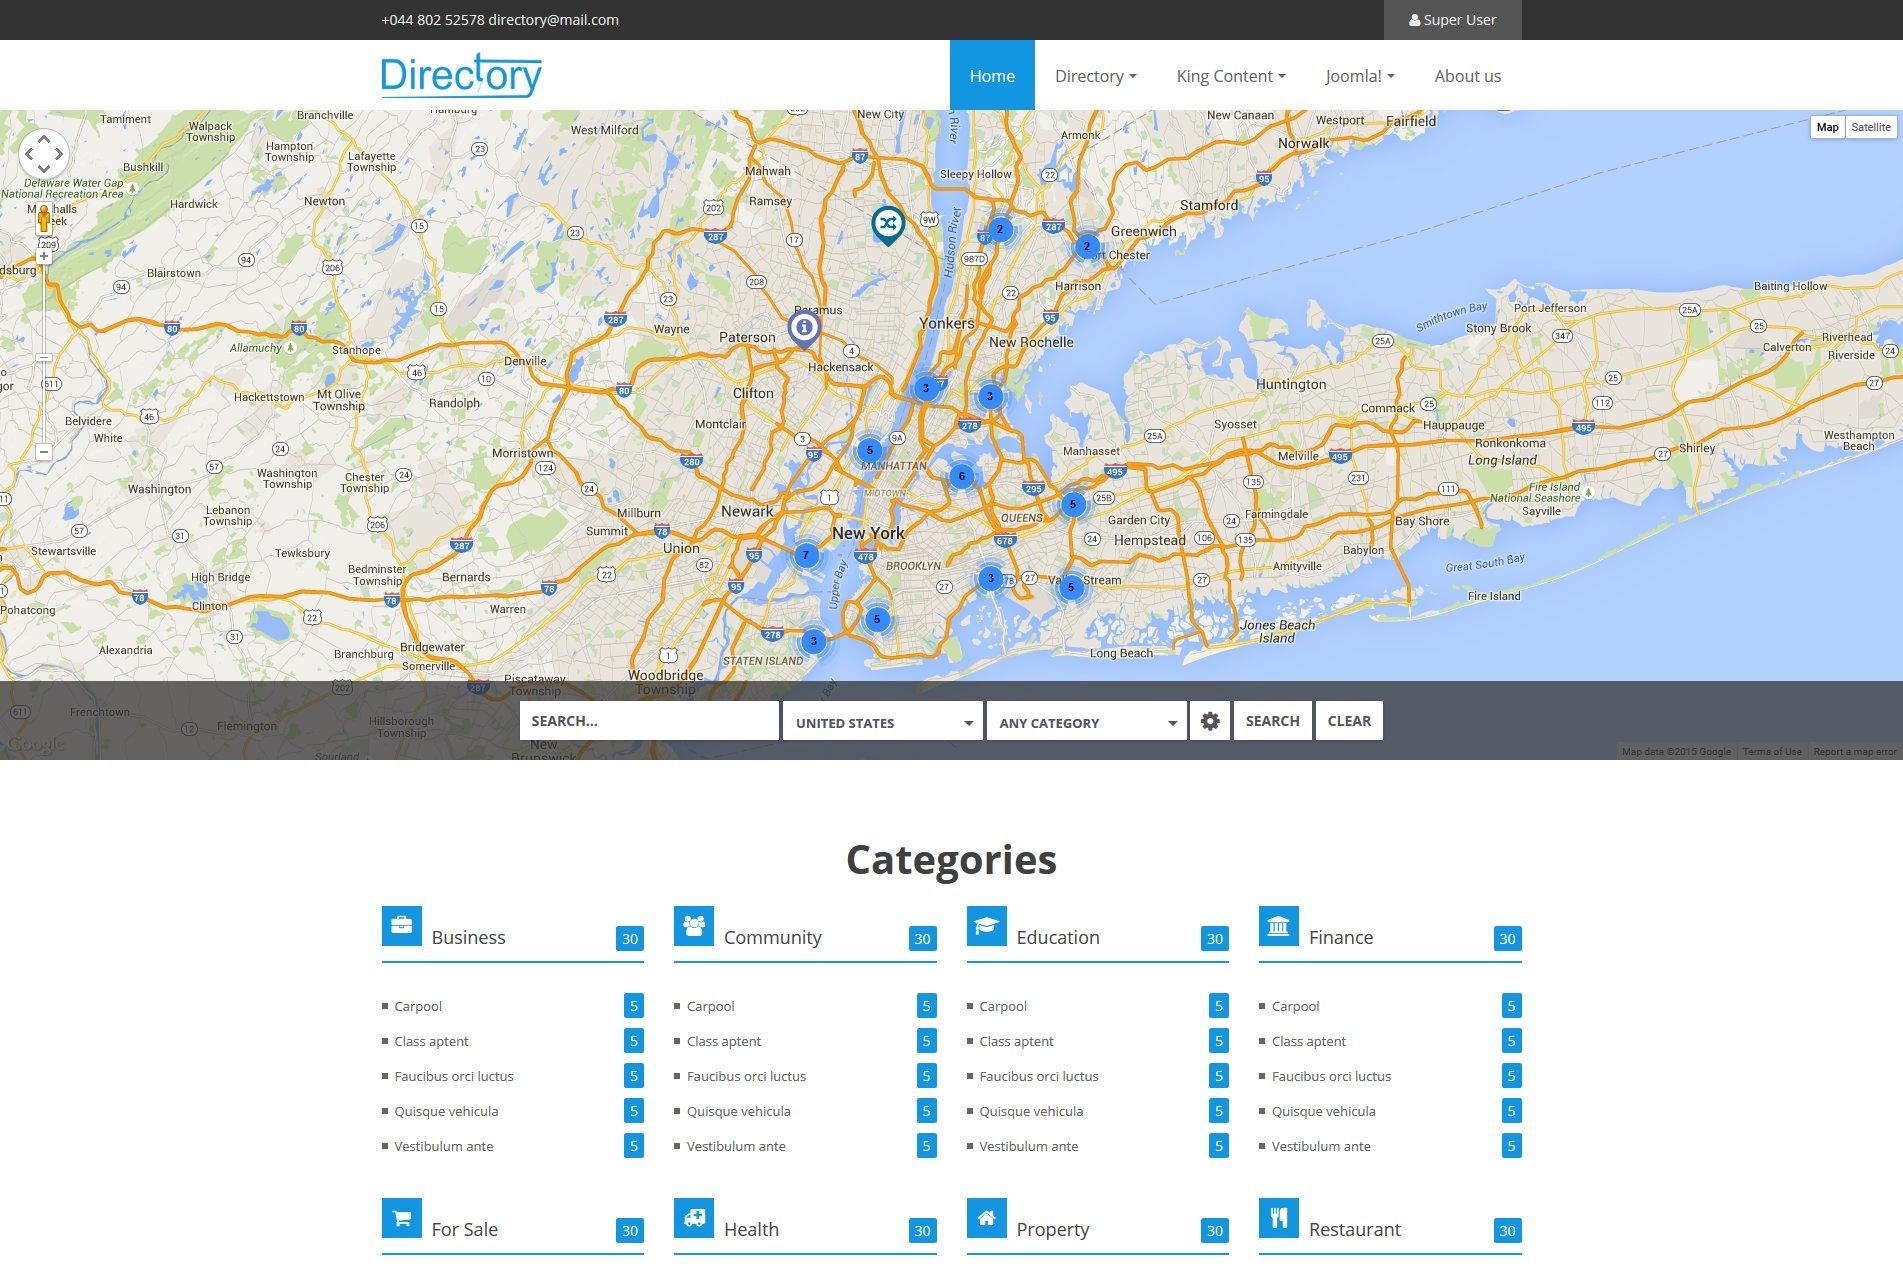 Directory listing joomla template joomla themes creative market accmission Choice Image